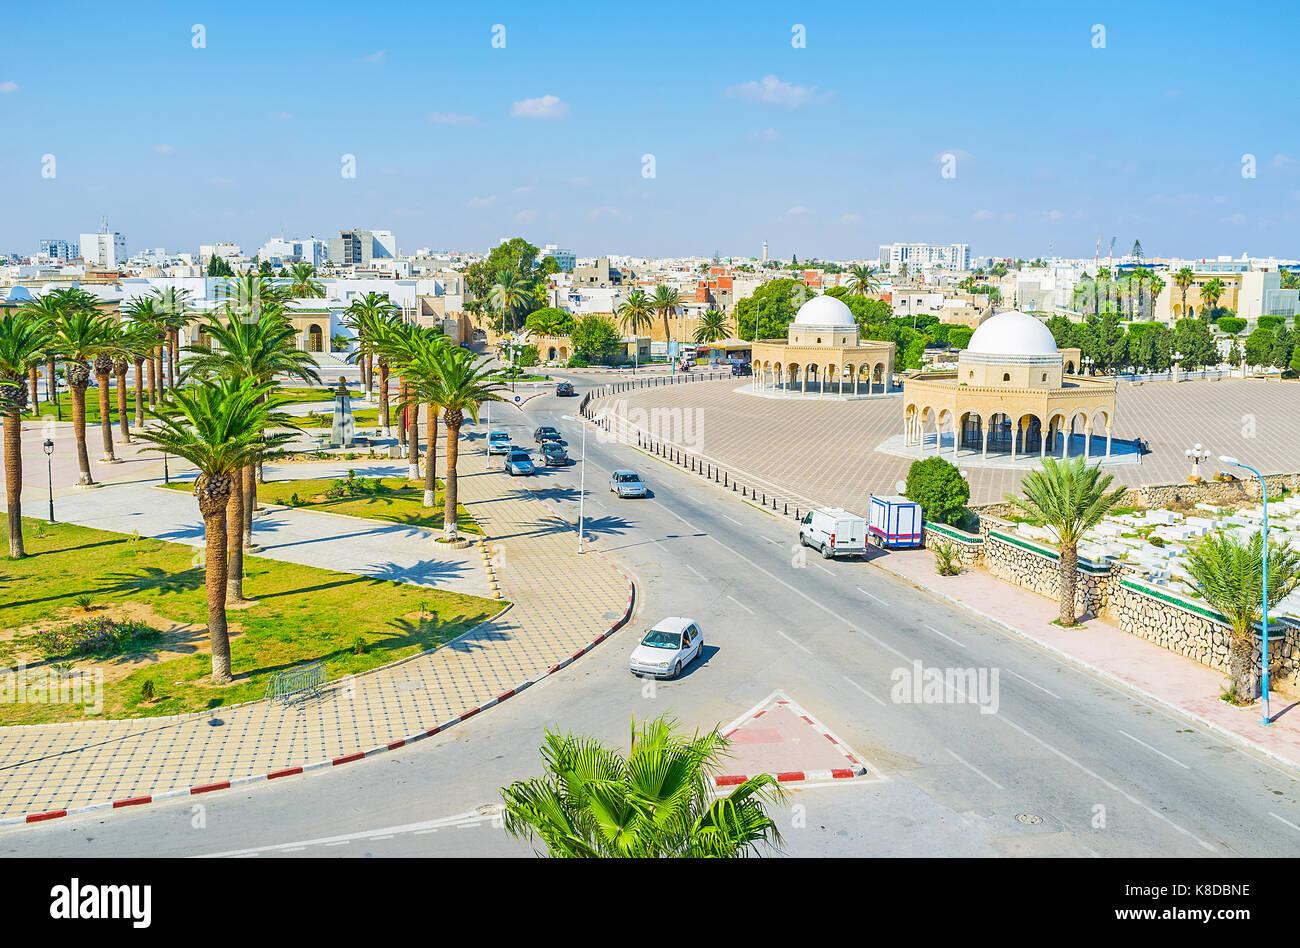 Aerial view of Habib Bourguiba square with two semetrical Arabic pavilions, Monastir, Tunisia. Stock Photo